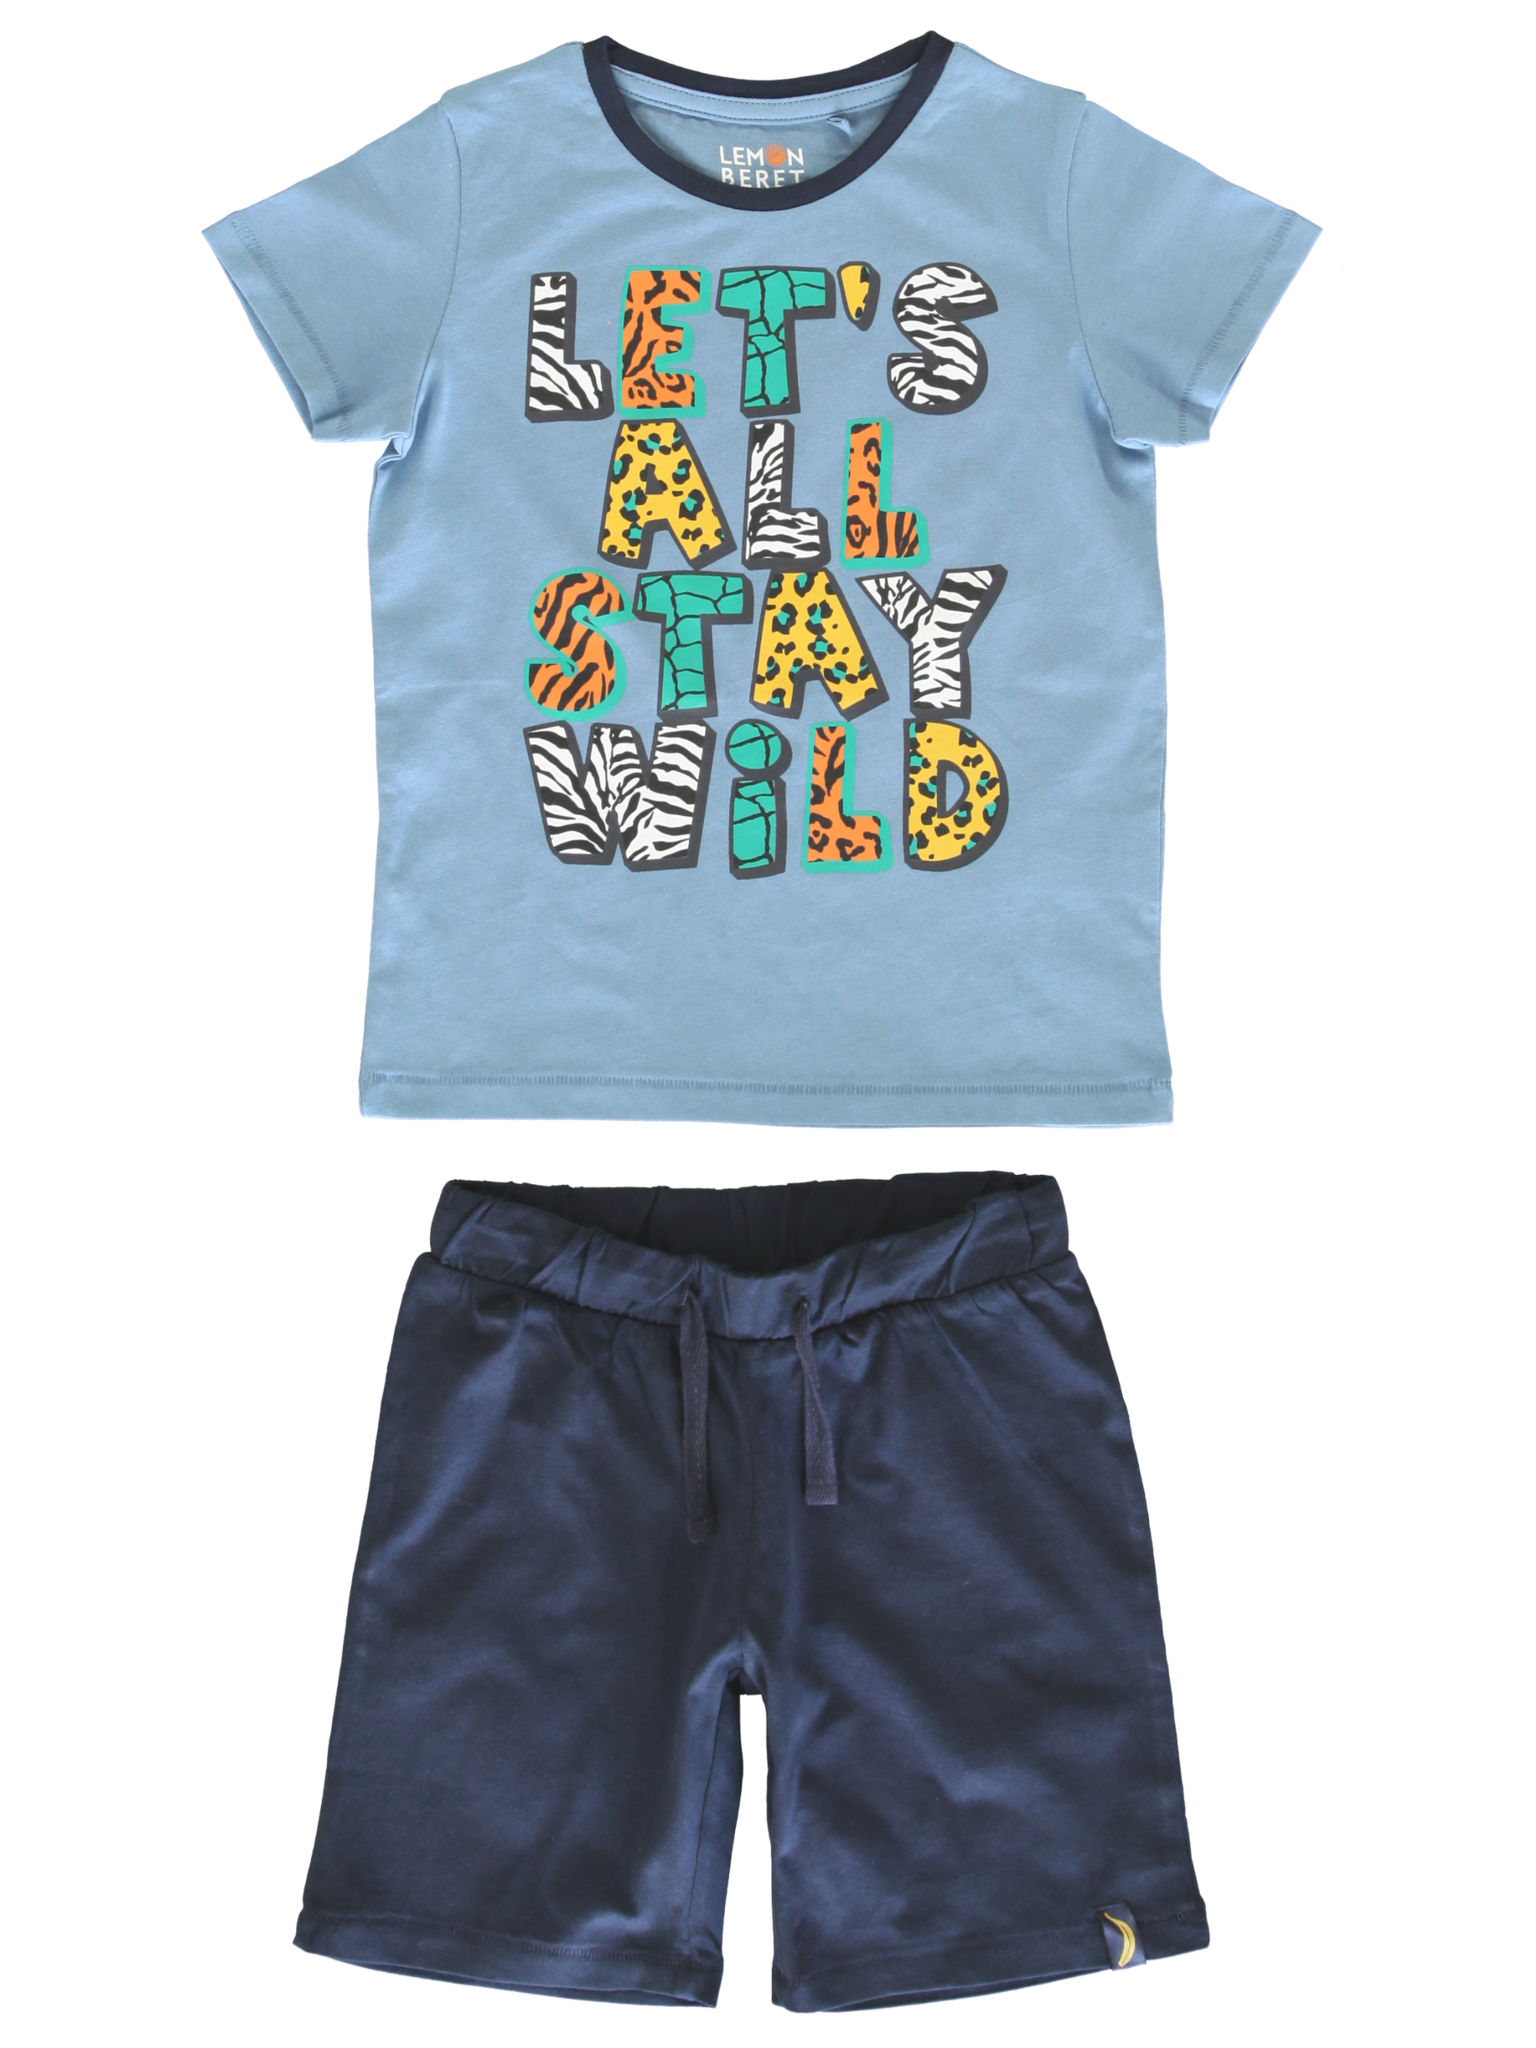 All Brands | Summerproducts Small Boys | Set | 12 pcs/box